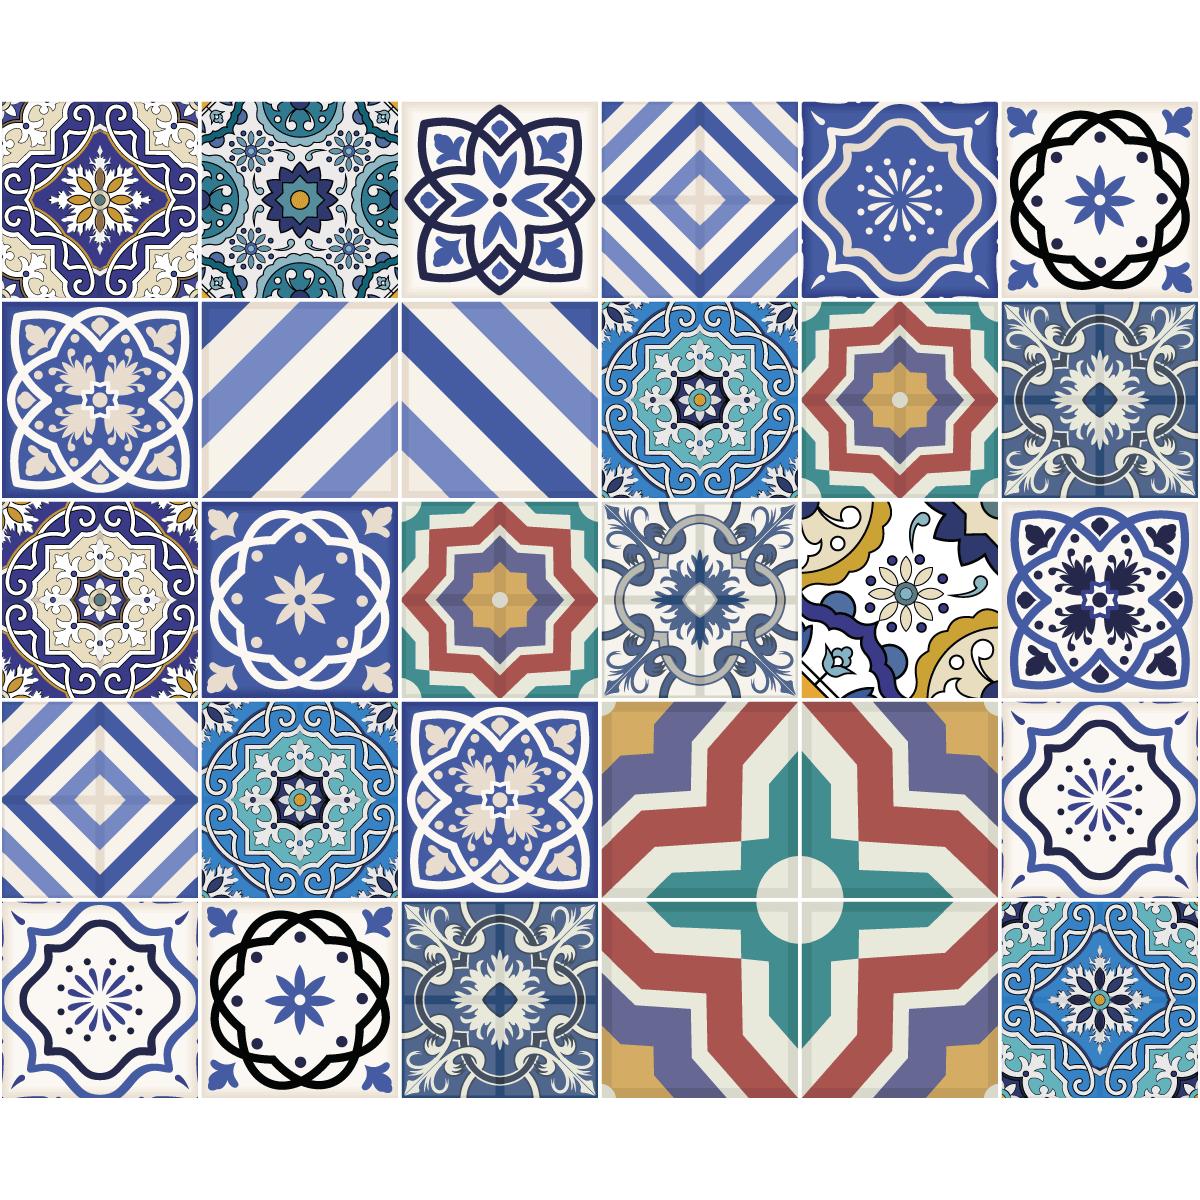 30 stickers carrelages azulejos elettra salle de bain et wc salle de bain ambiance sticker. Black Bedroom Furniture Sets. Home Design Ideas